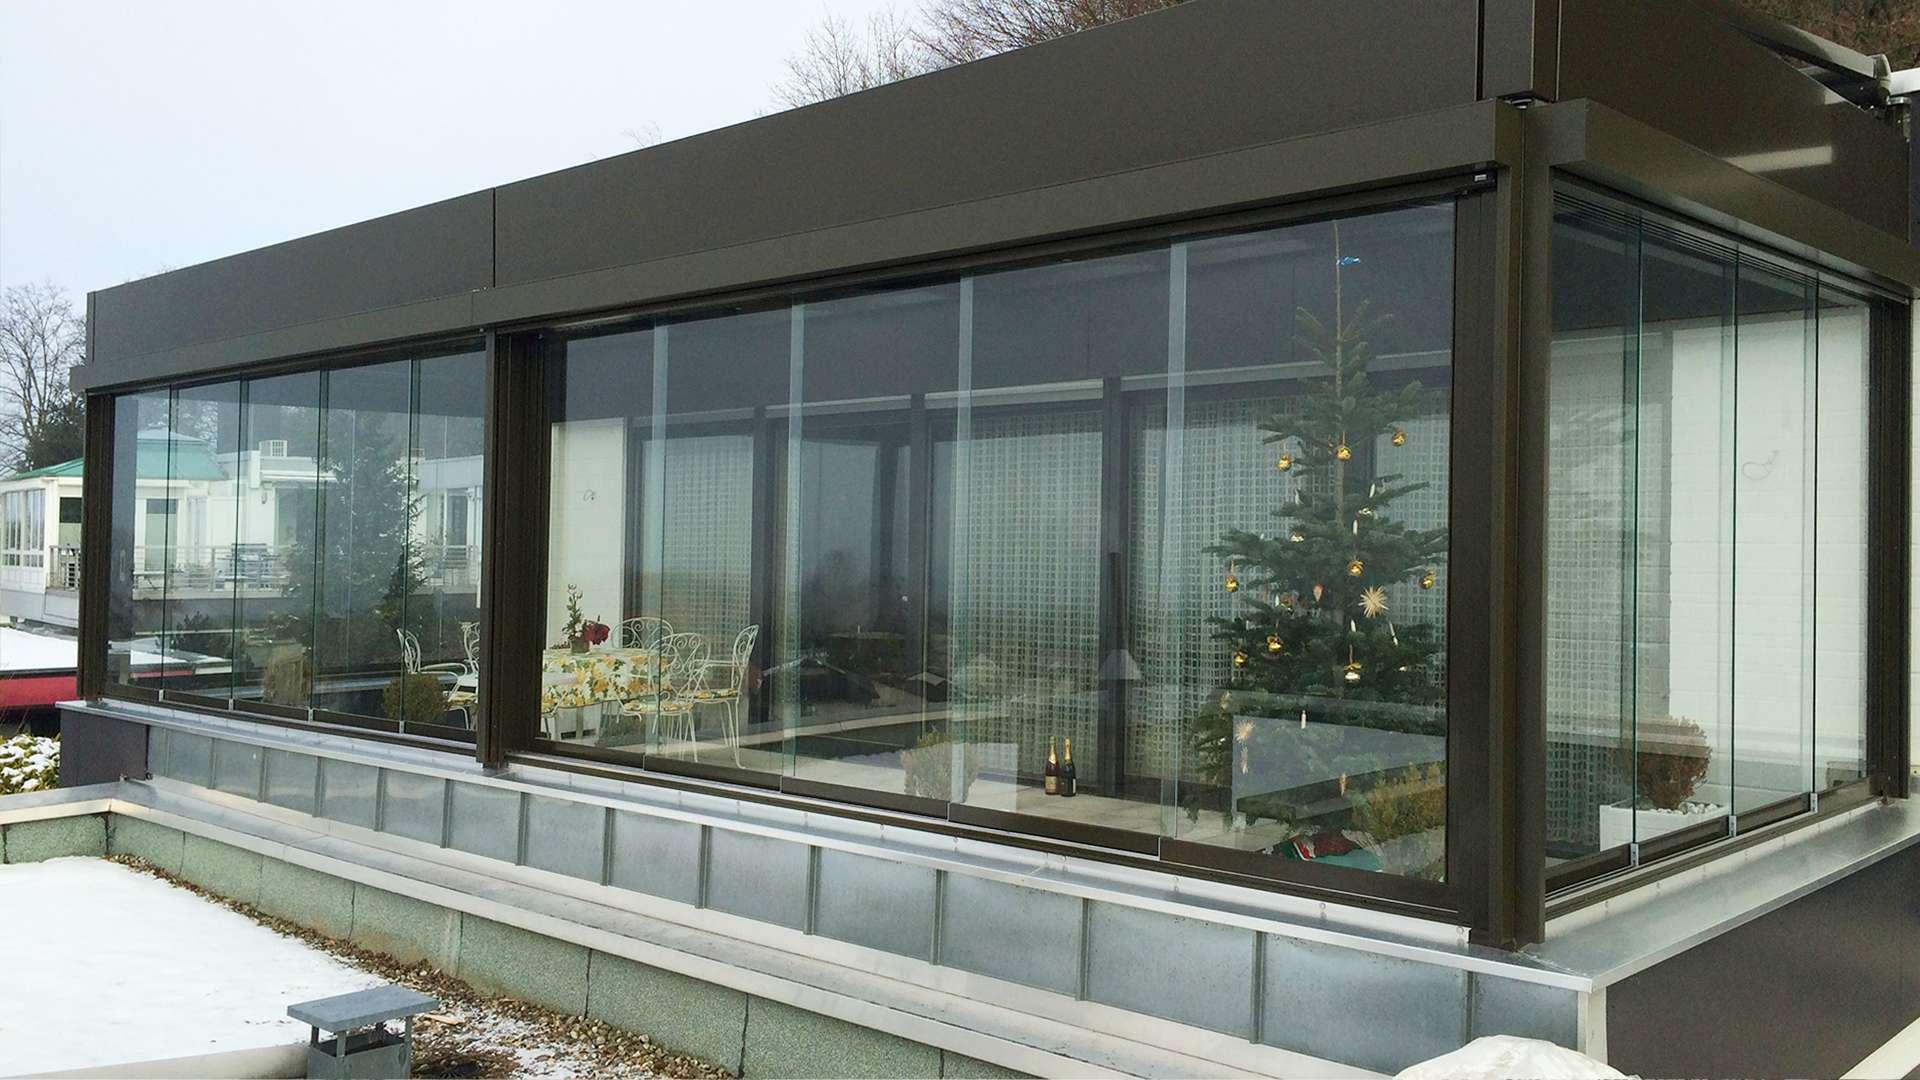 Fahrner Glashaus